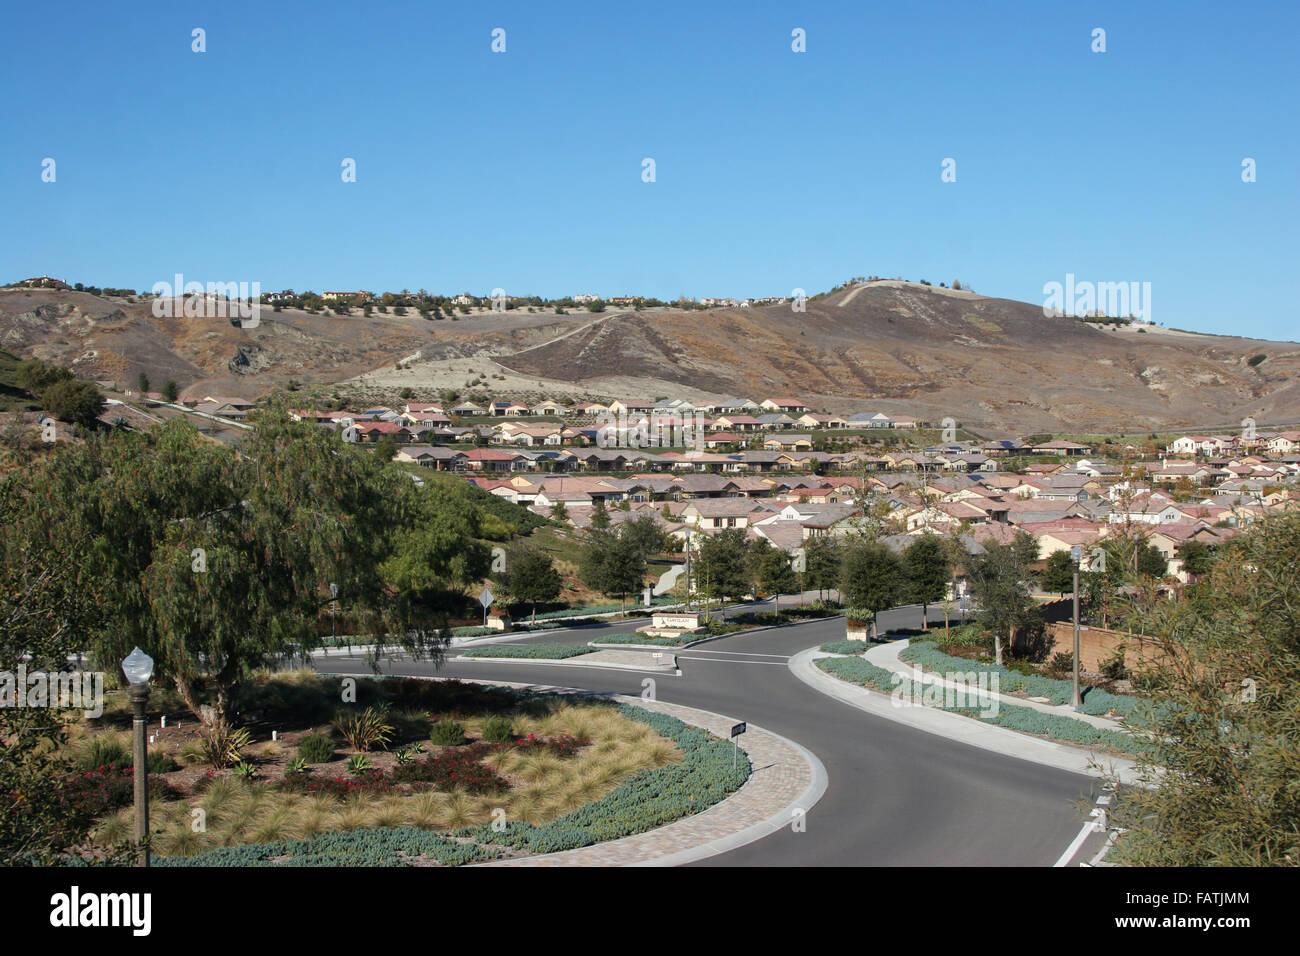 Del Webb at Rancho Mission Viejo California - Stock Image